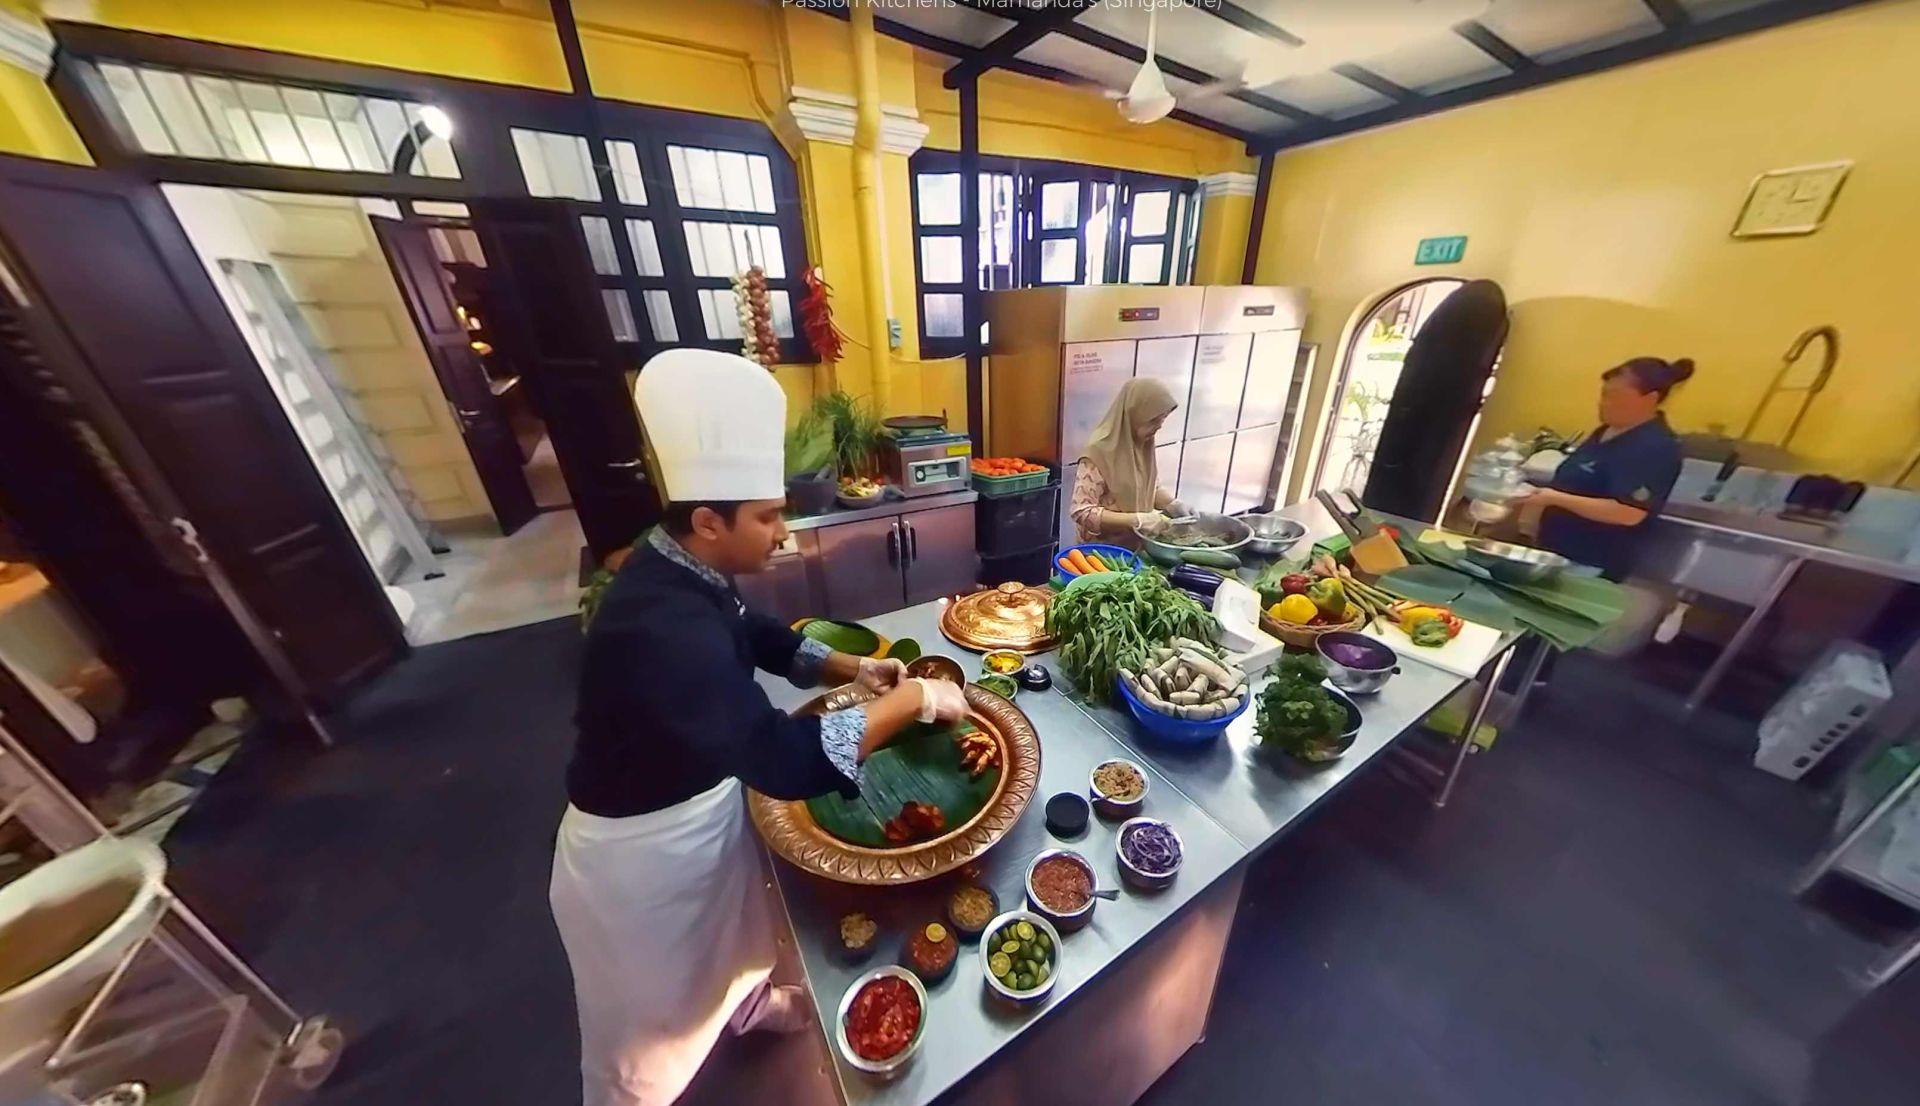 Passion Kitchens